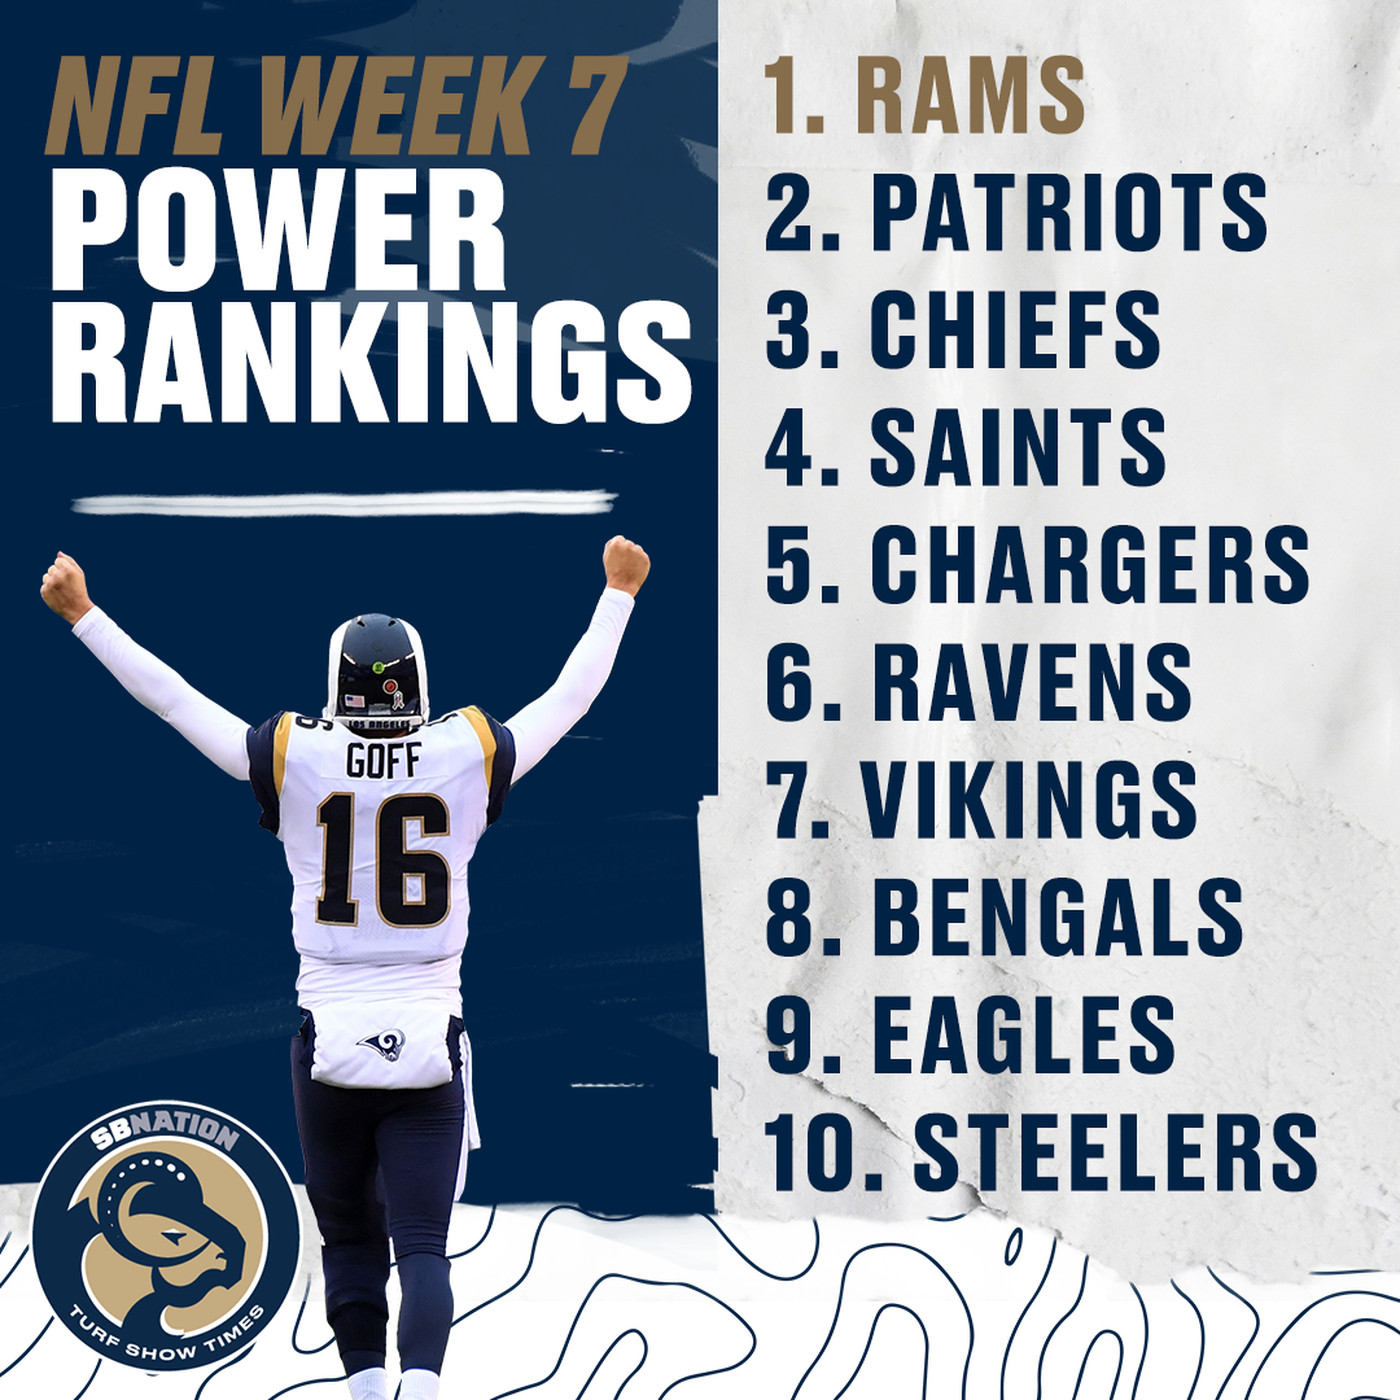 0137cbbb 2018 NFL power rankings, Week 7: LA Rams, on top - Turf Show Times